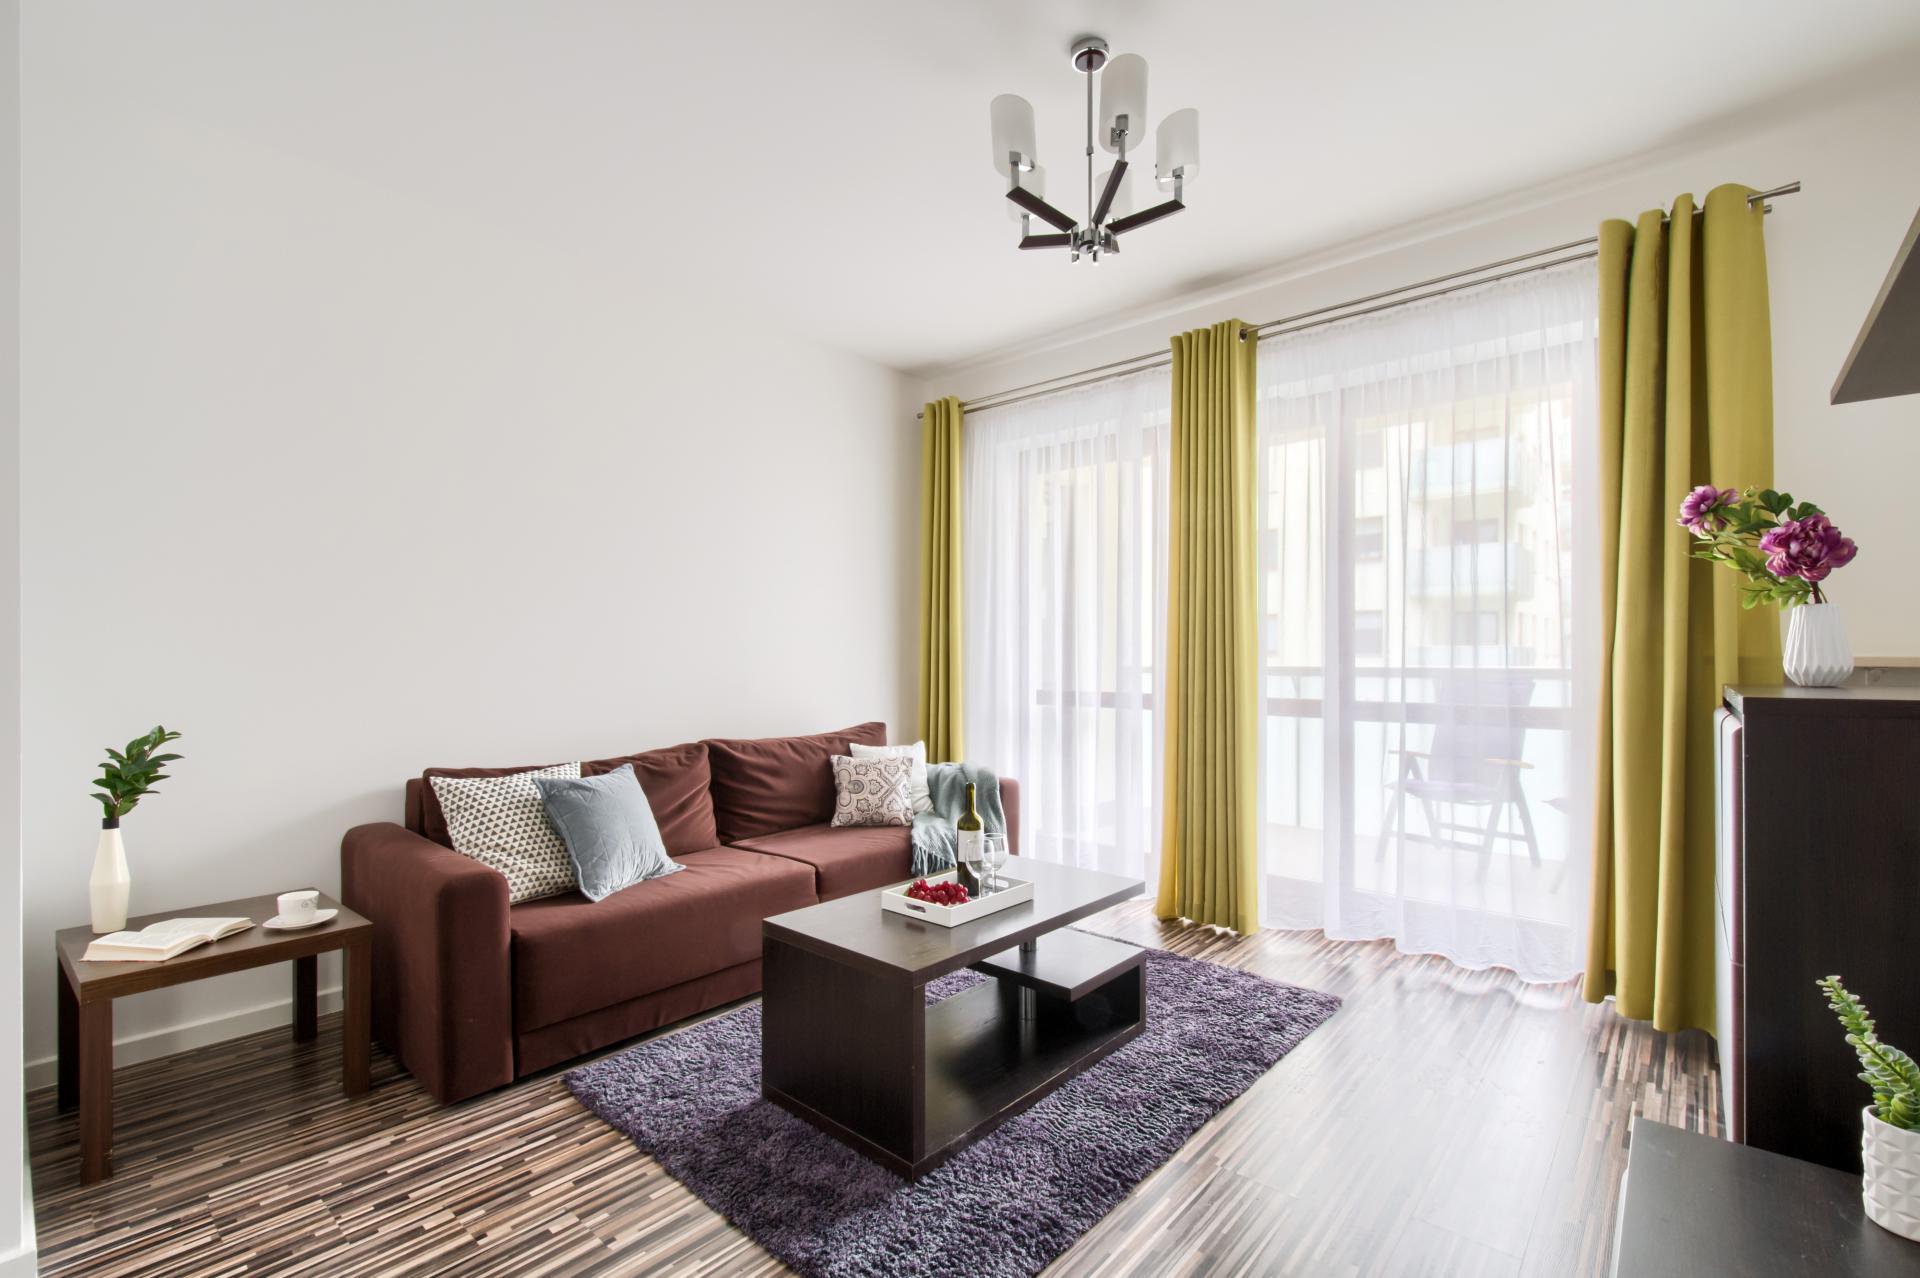 Sofa at Gieldowa Apartment